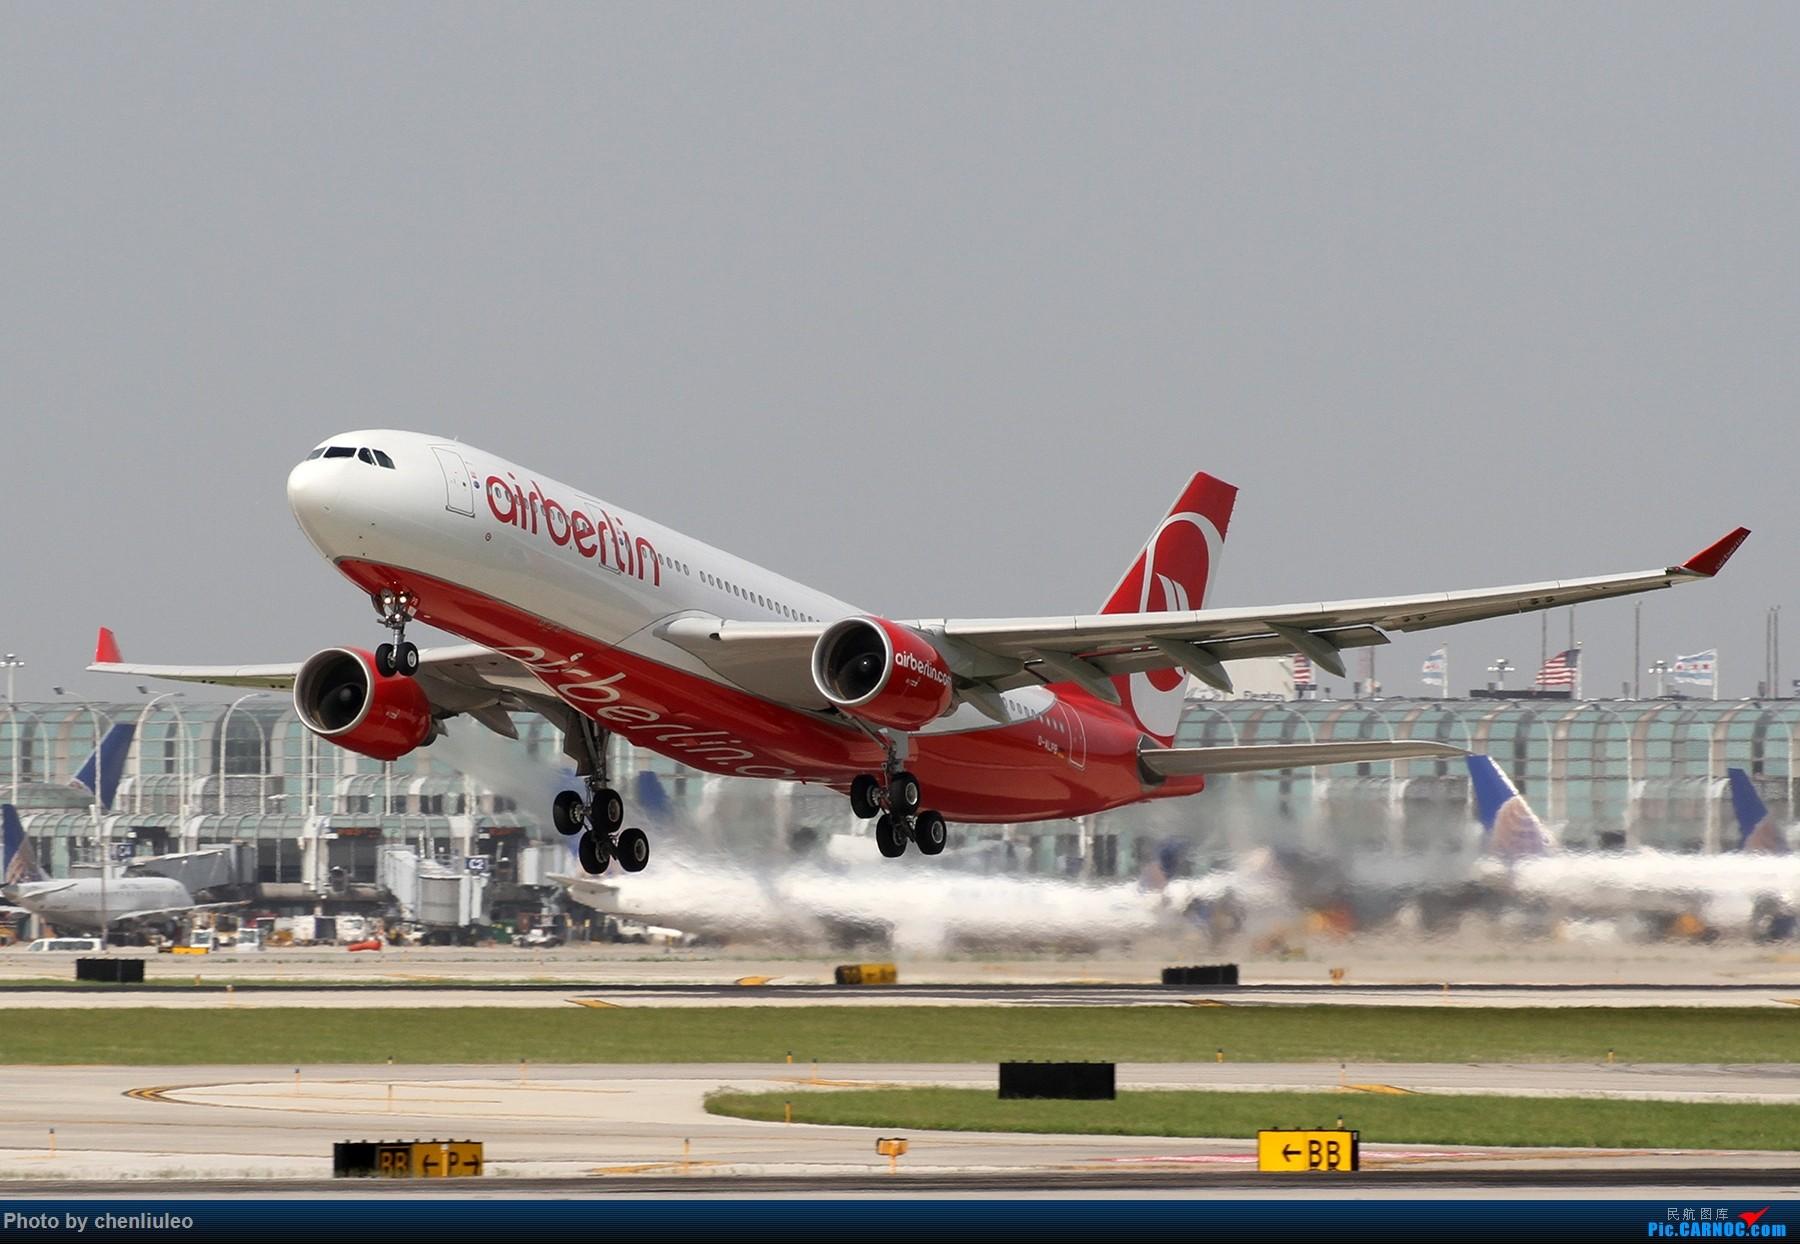 Re:[原创]【北美飞友会】芝加哥奥黑尔机场首拍 AIRBUS A330-200 D-ALPB 美国芝加哥奥黑尔国际机场